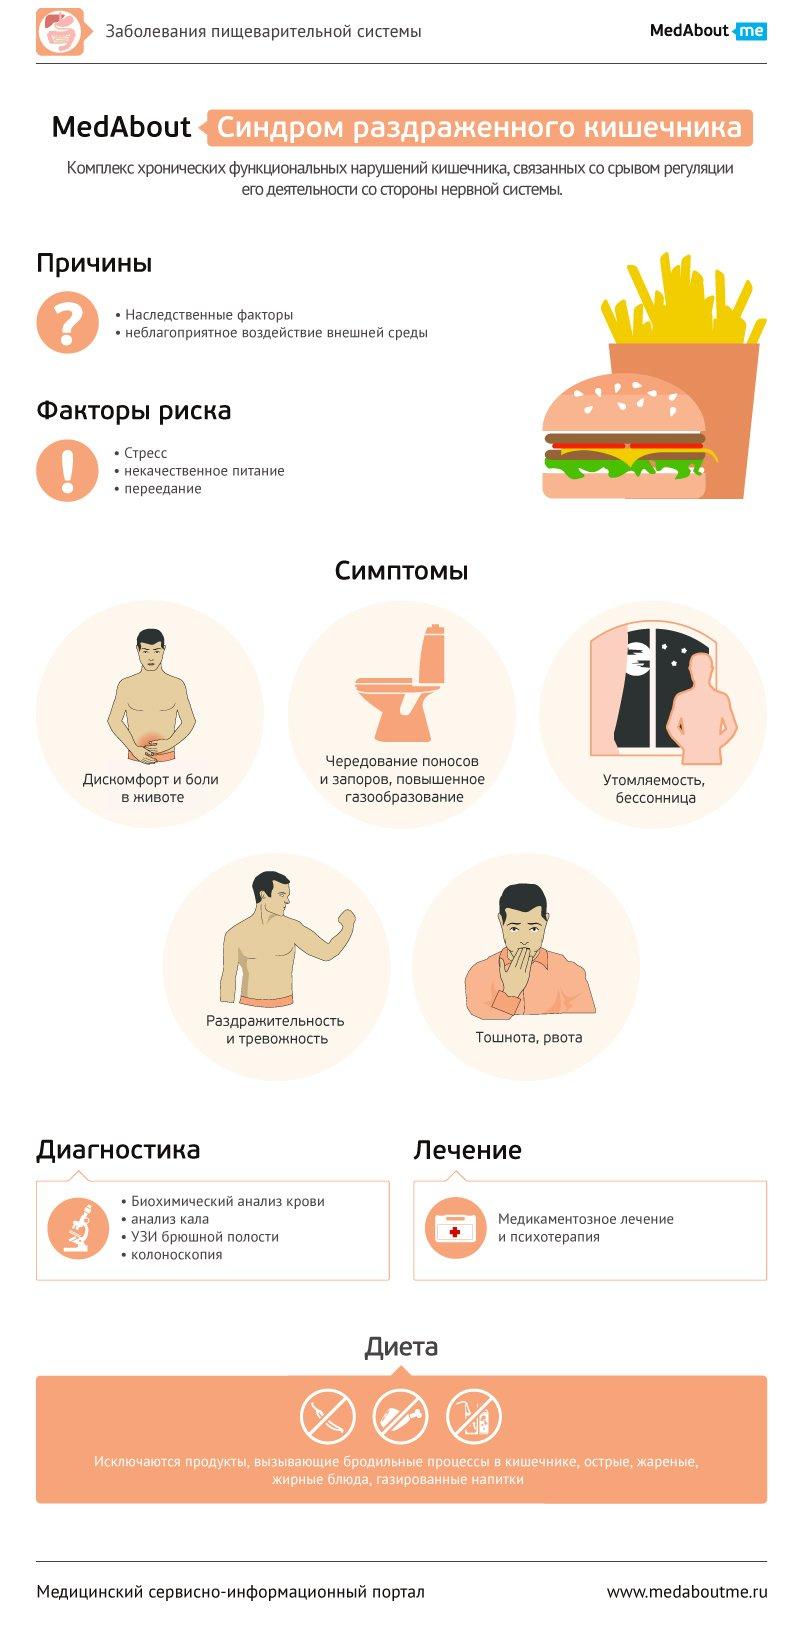 Диета синдроме раздраженного кишечника запорами